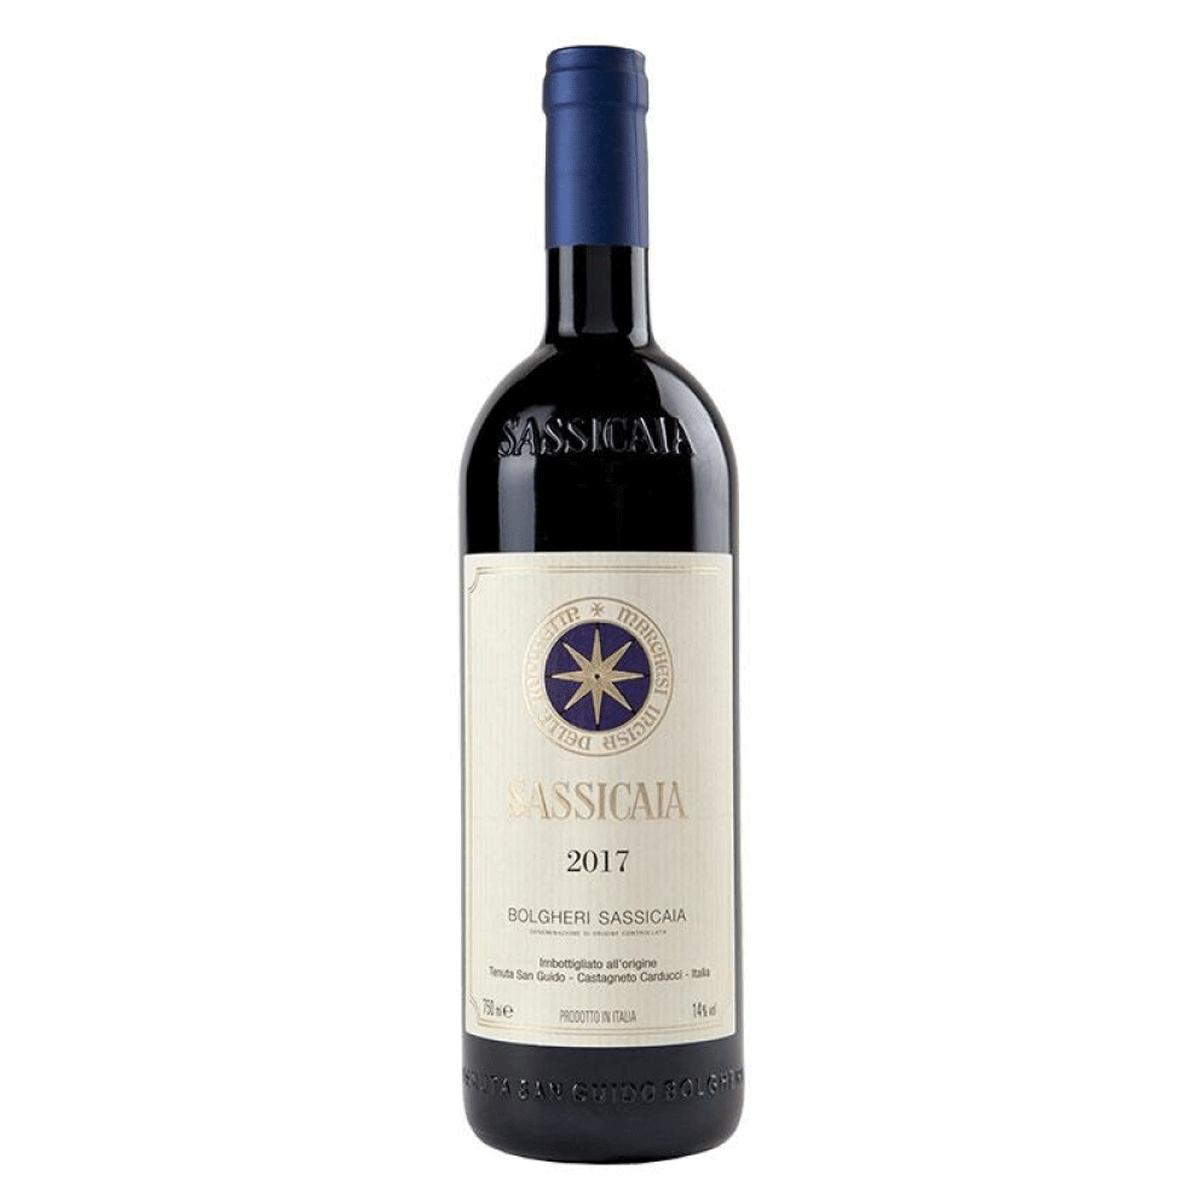 Vinho Sassicaia DOC Tenuta San Guido 2017 750ml